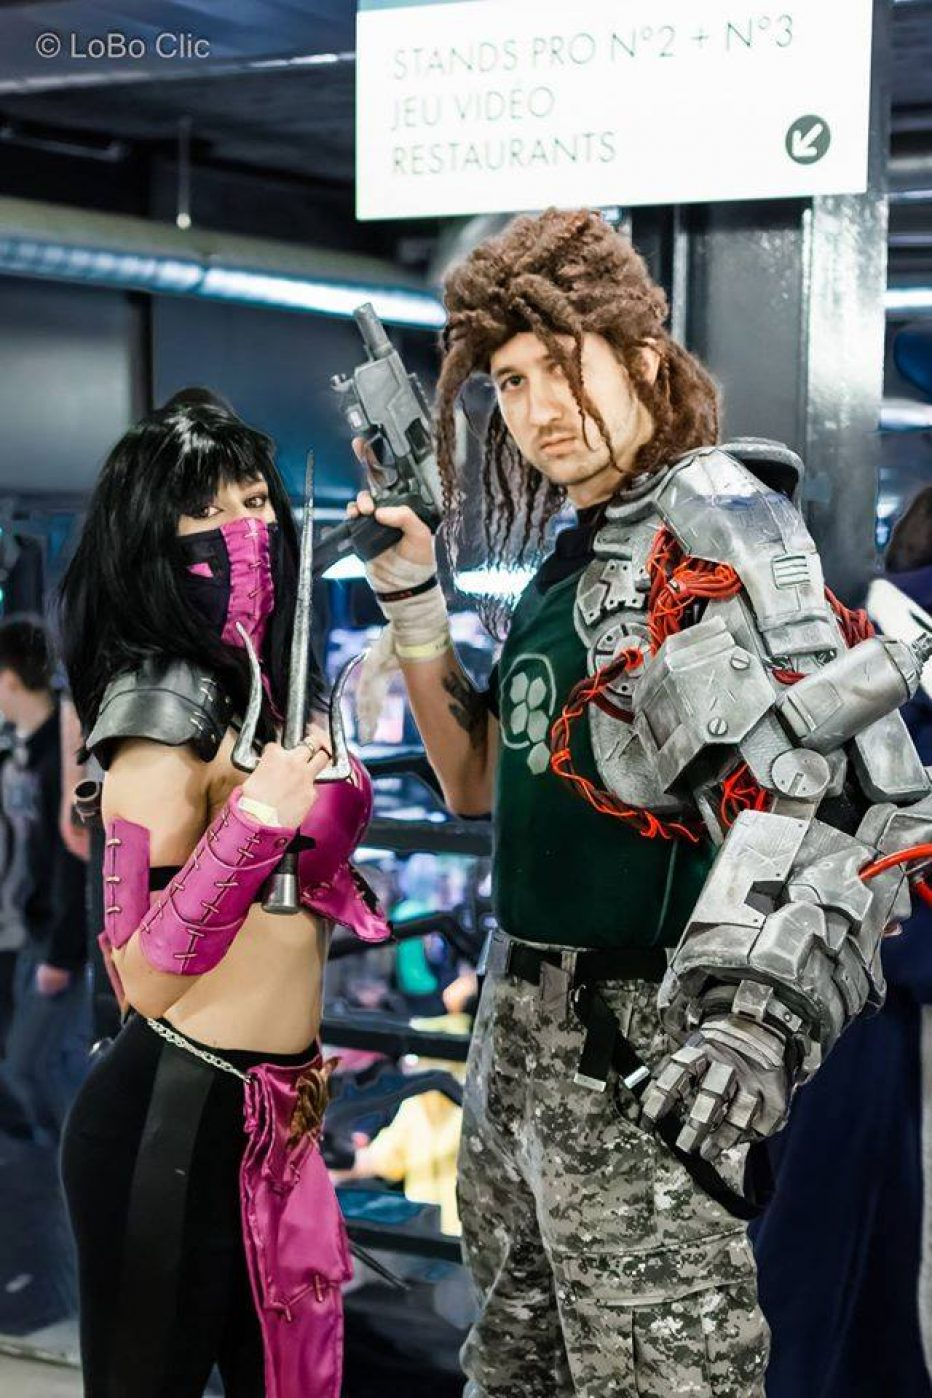 Bionic-Commando-Nathan-Spencer-Cosplay-Gamers-Heroes-8.jpg